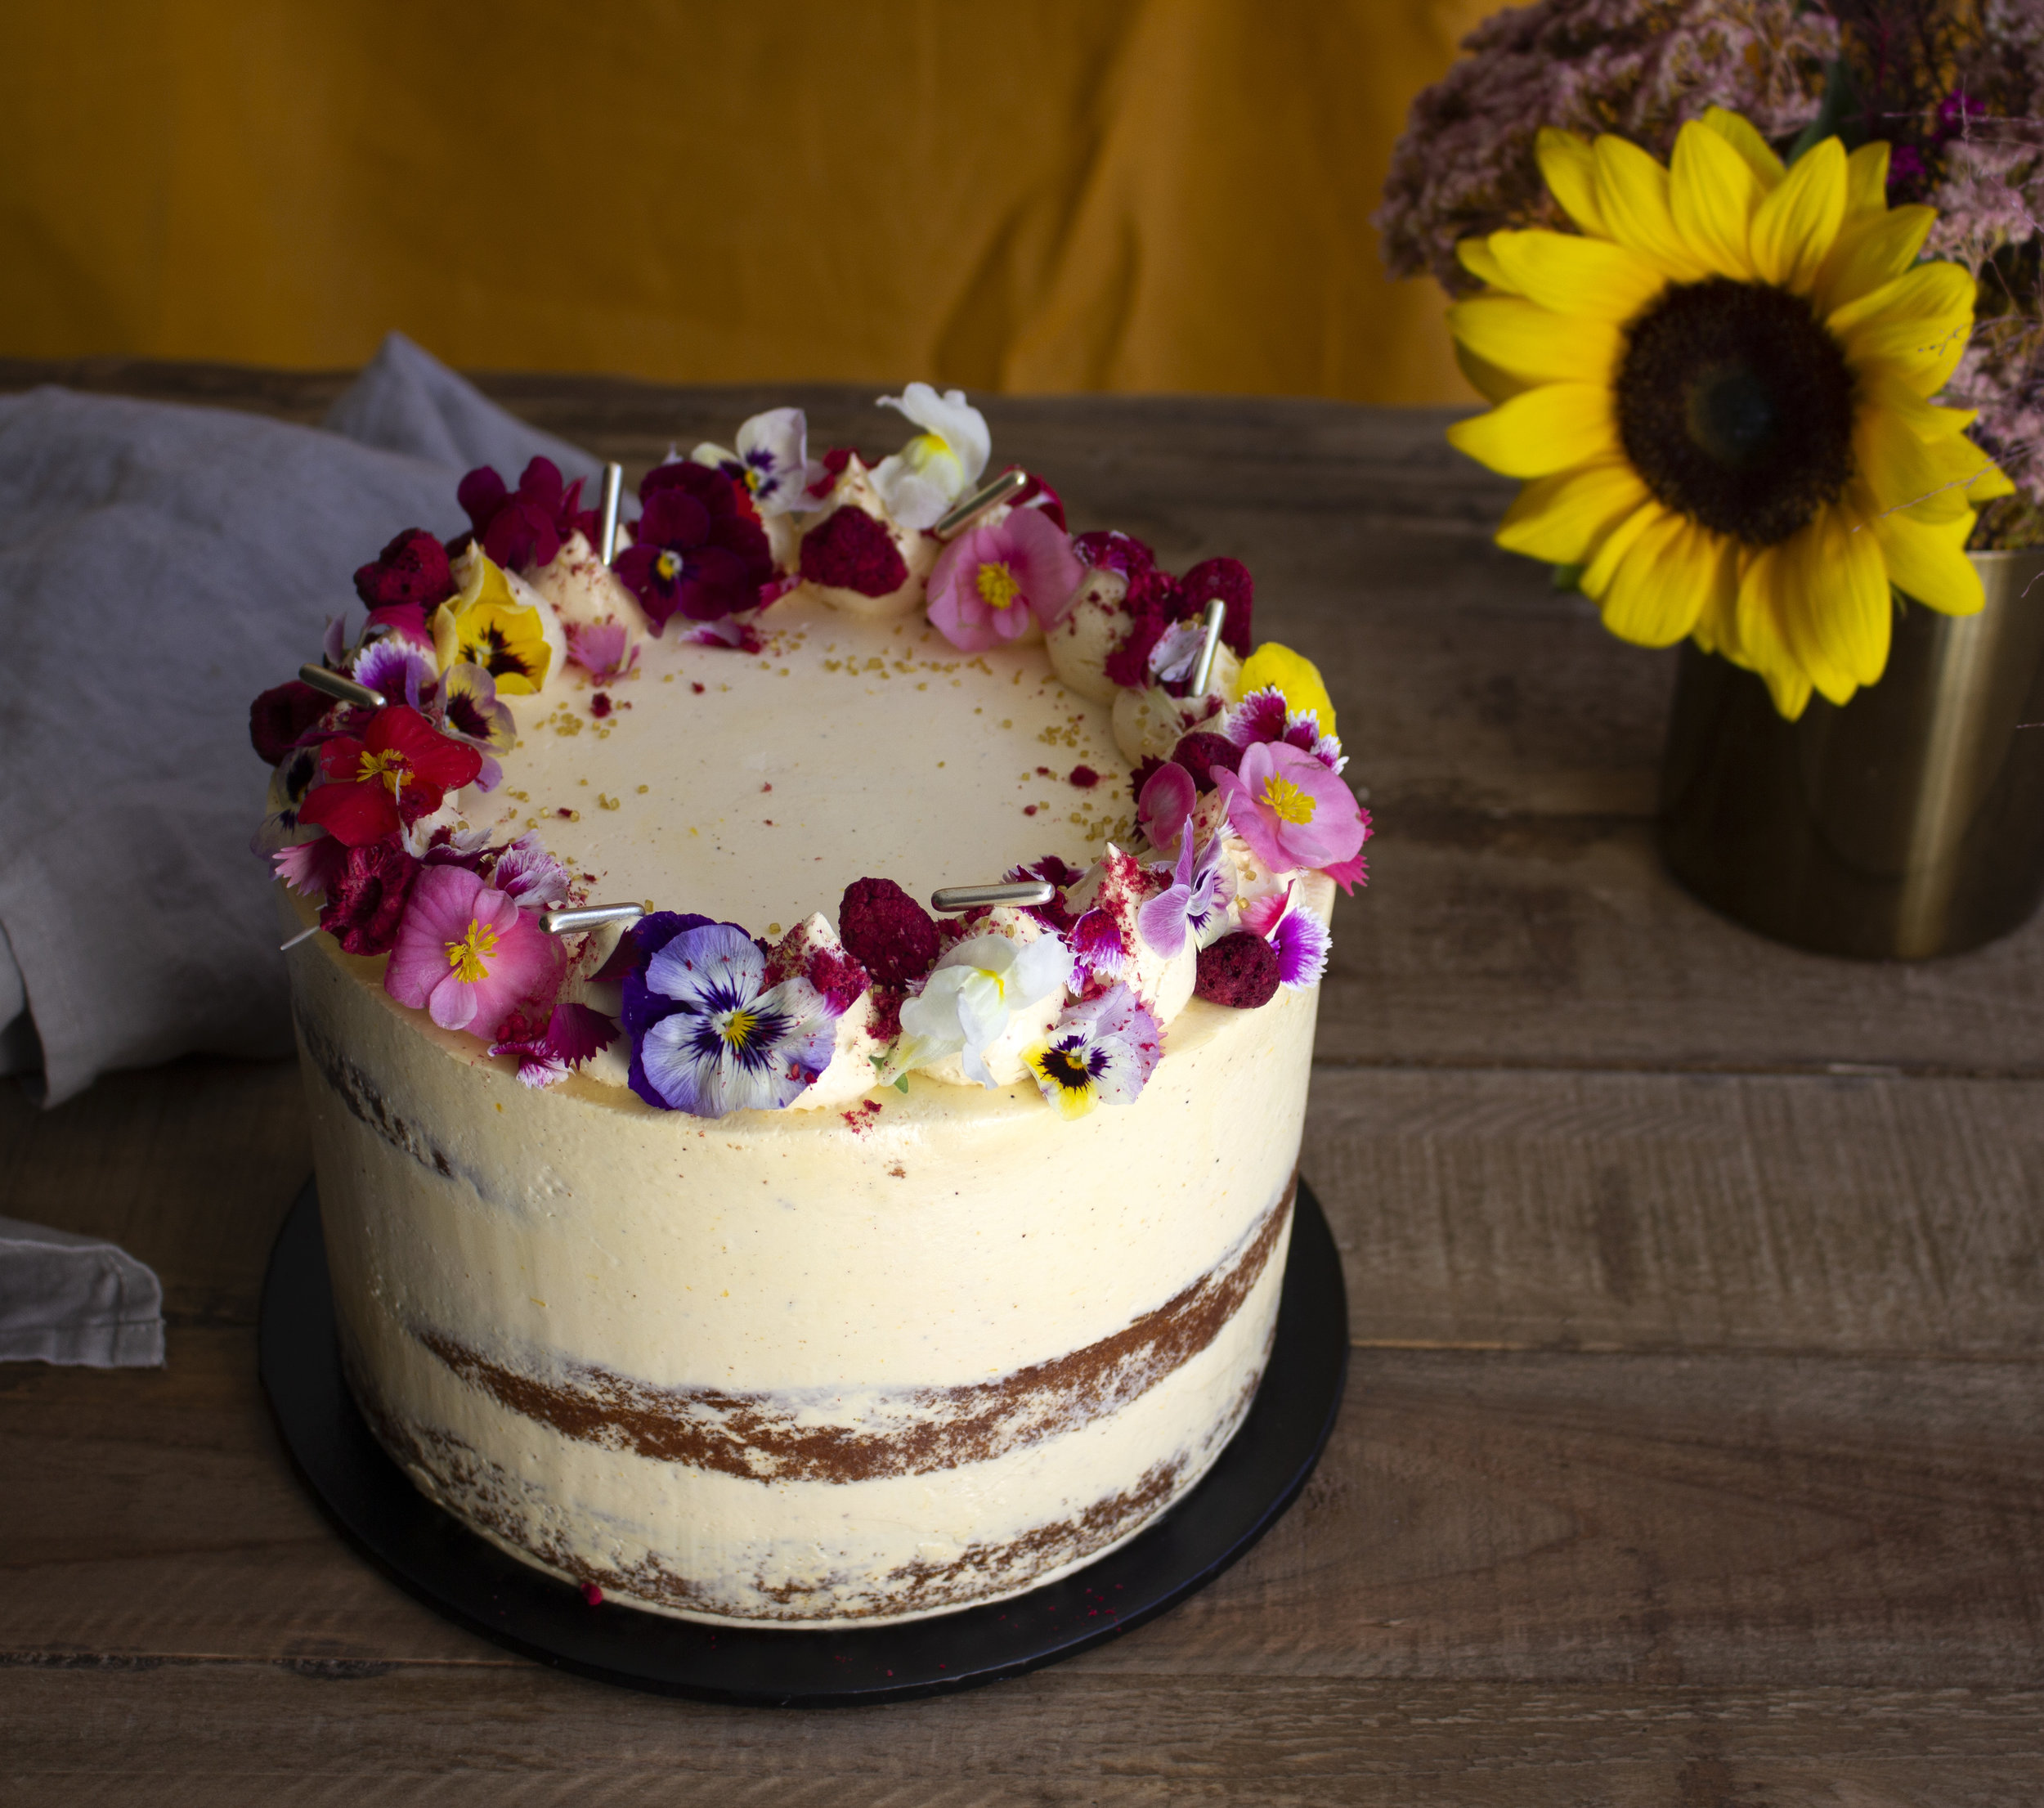 cake177.jpg